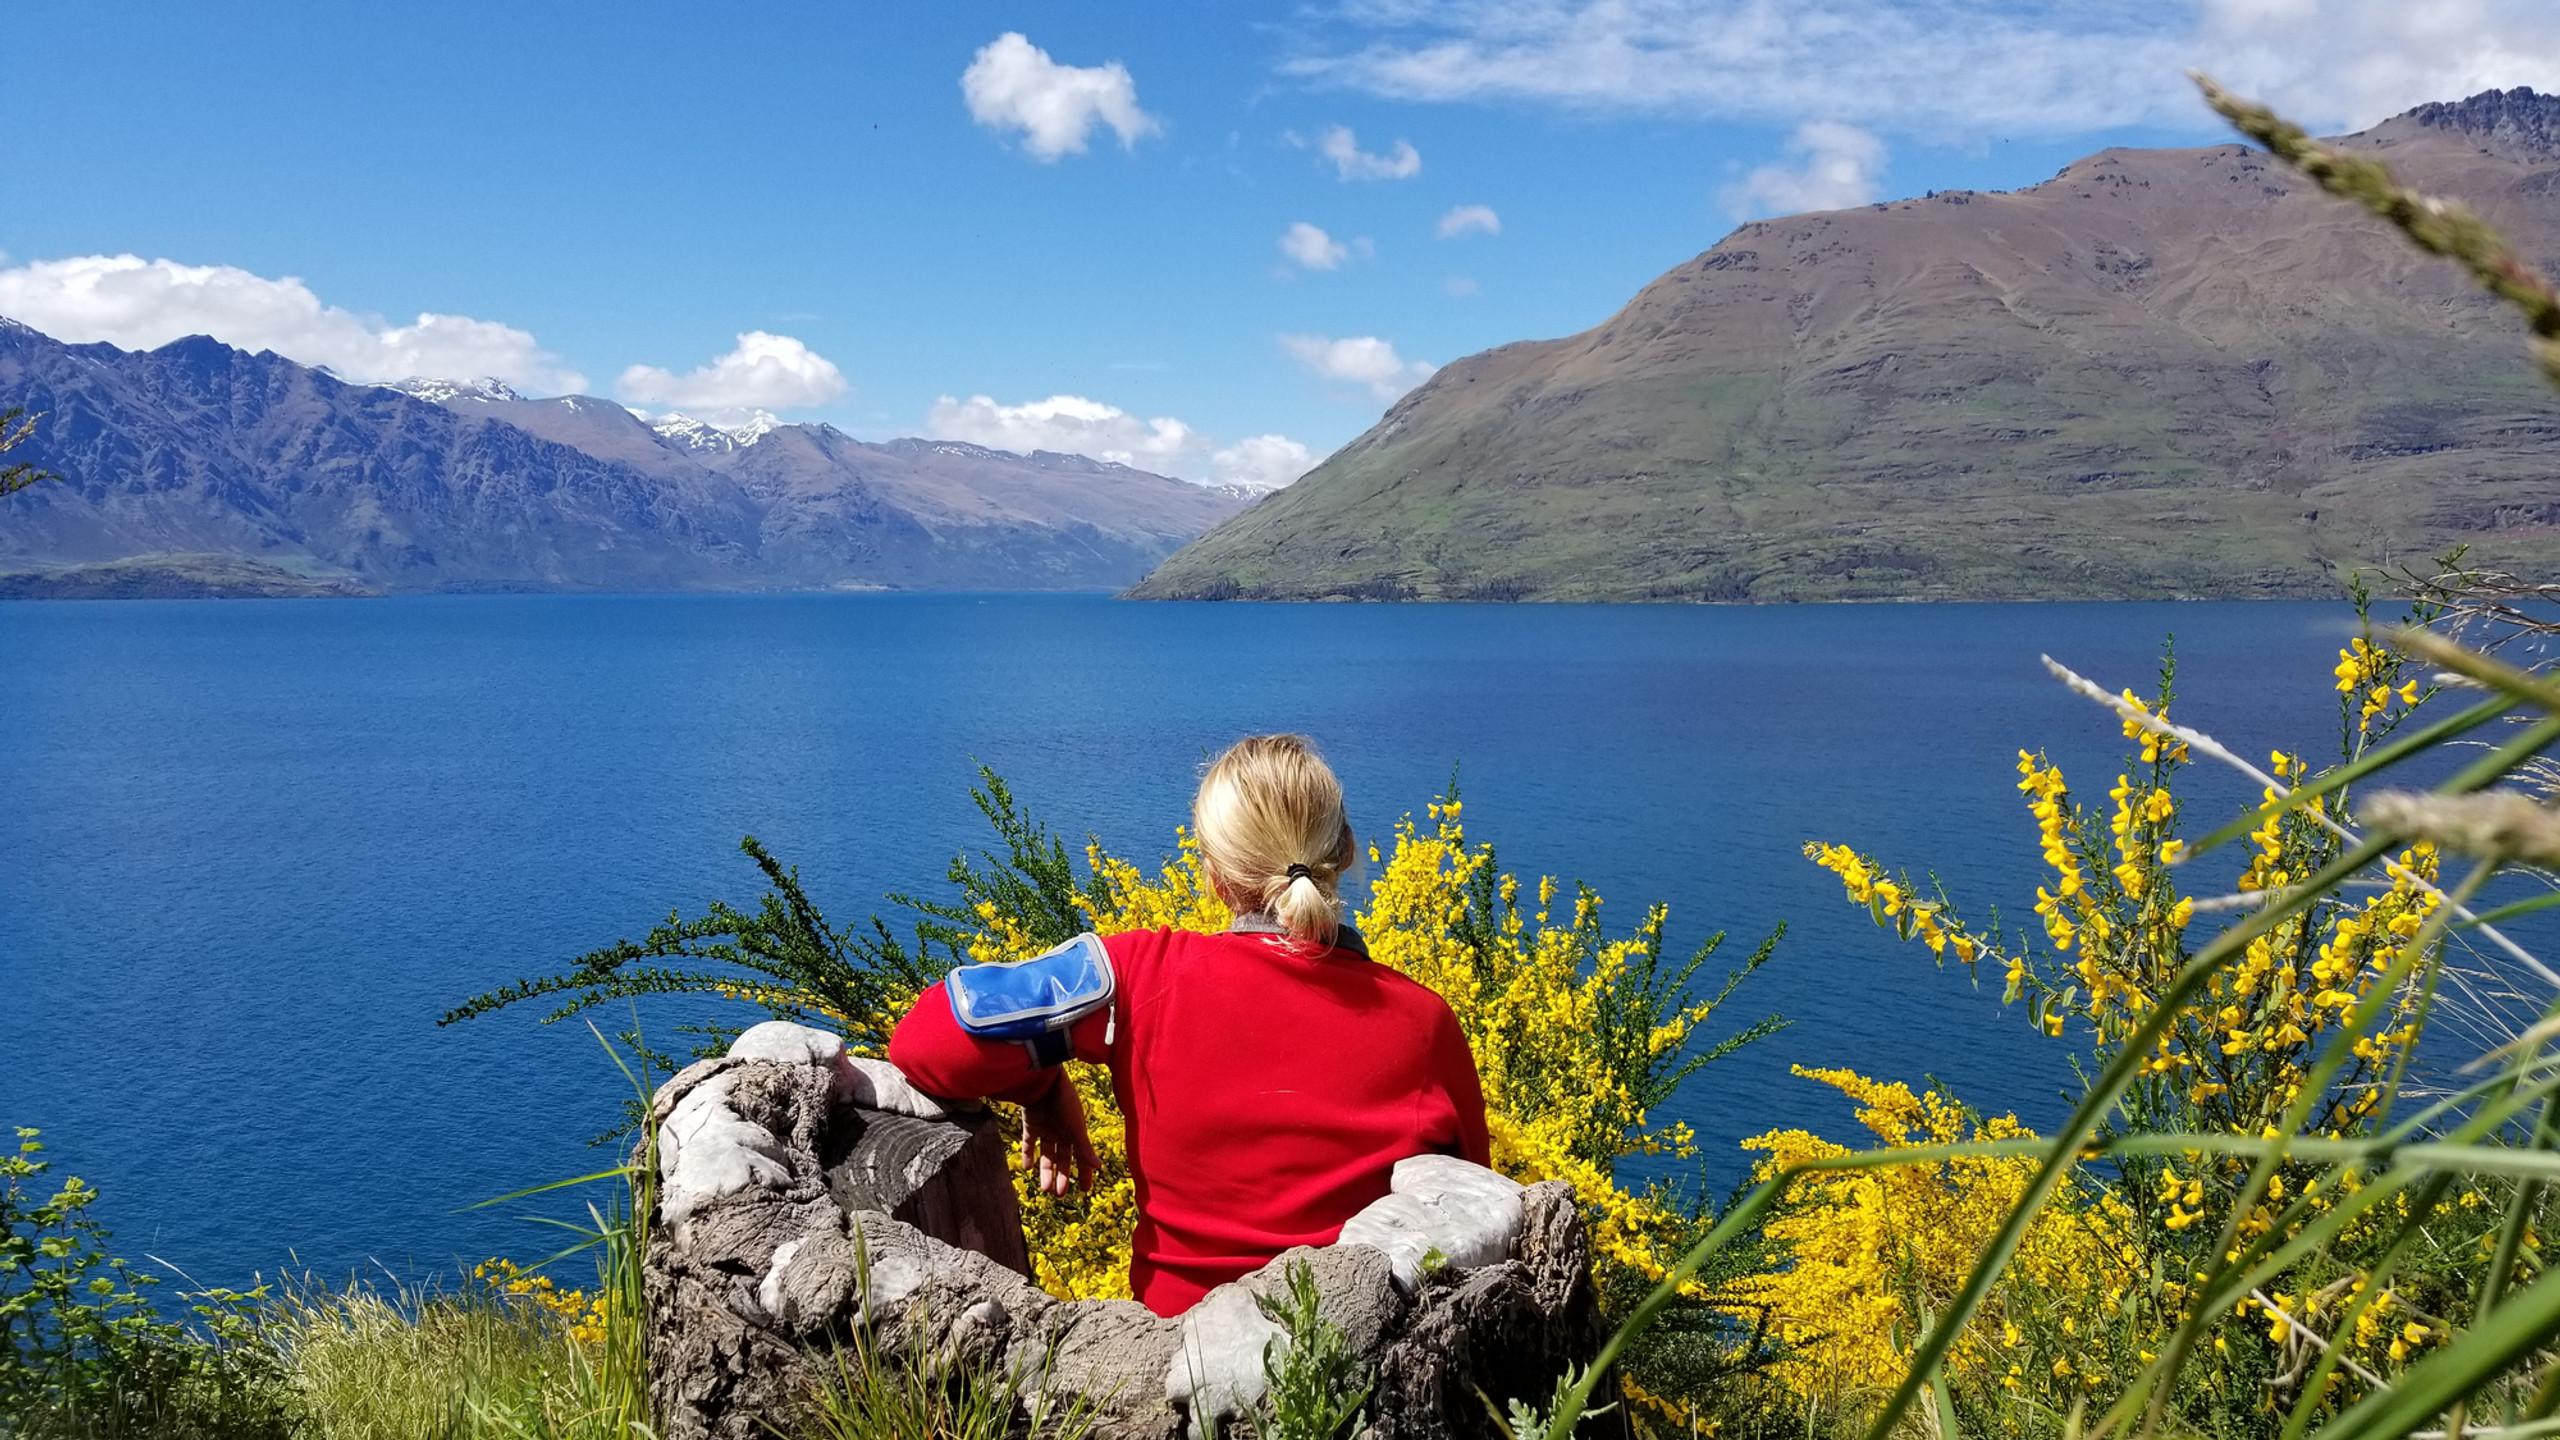 Lake Wakatipu, Queenstown, New Zealand activities, New Zealand tours